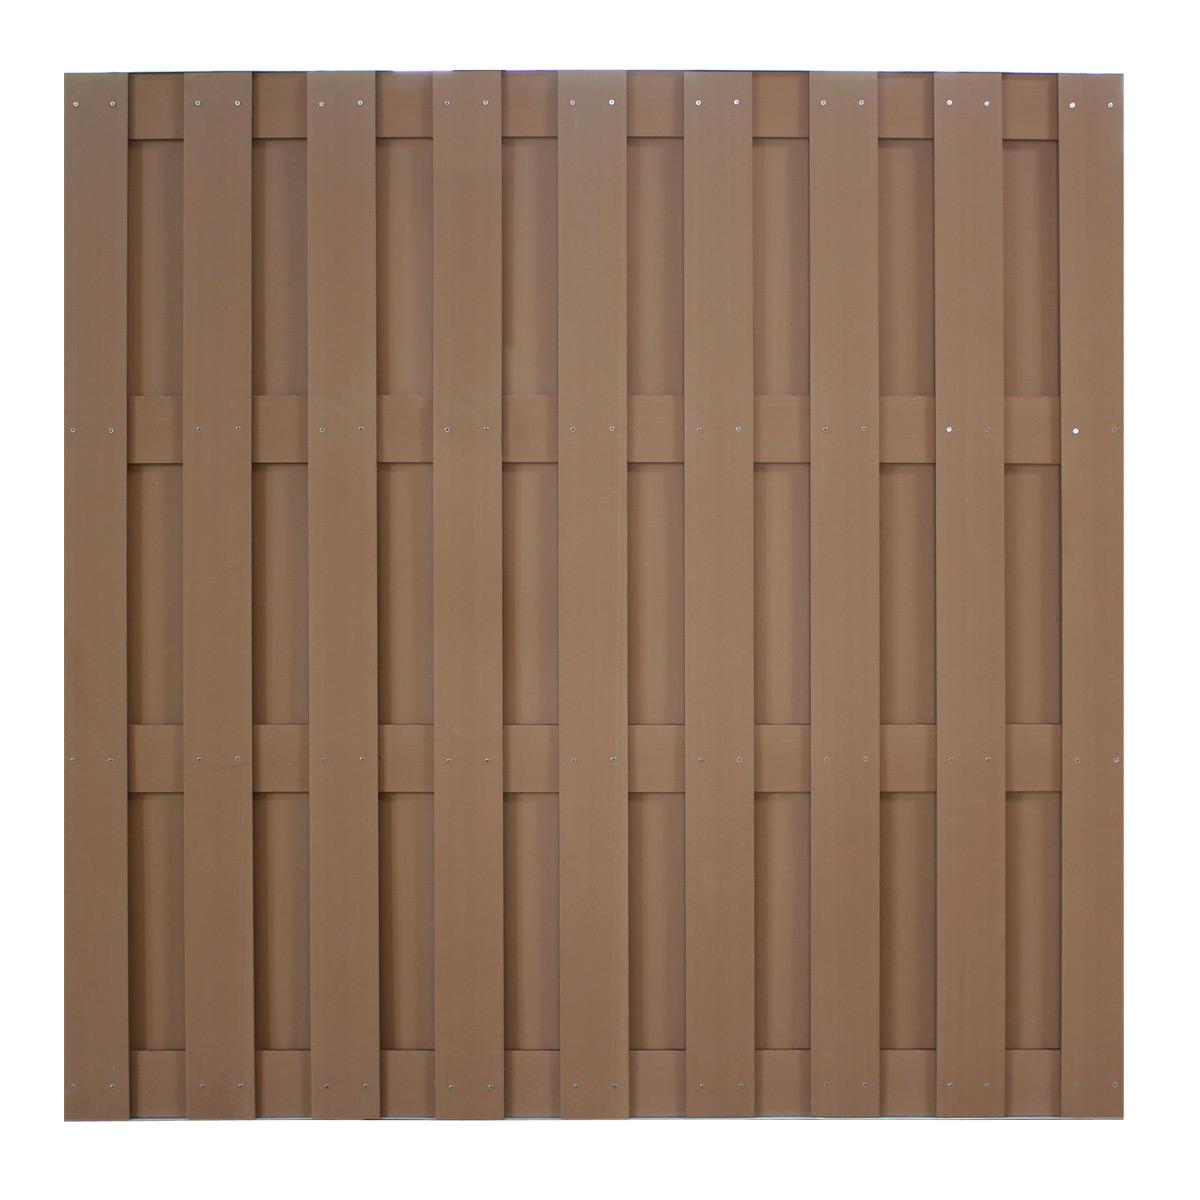 Neuholz Wpc Zaun 180x180cm Sichtschutz Zaunelemente